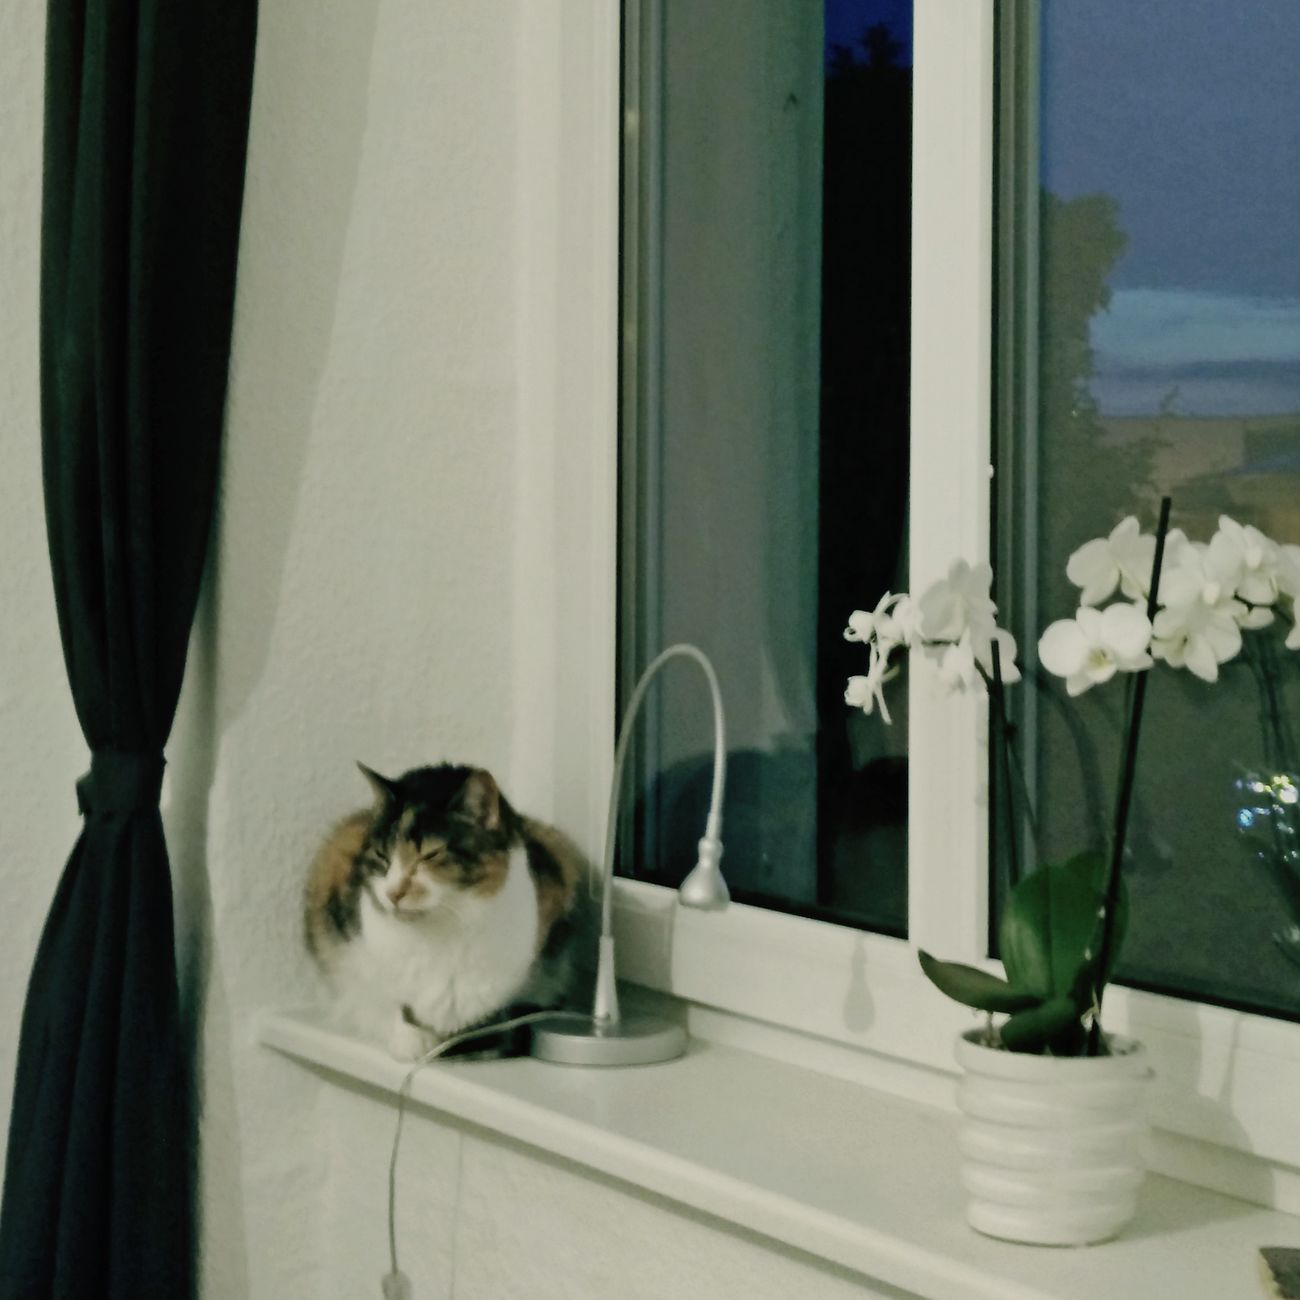 Nachtkatzencontent